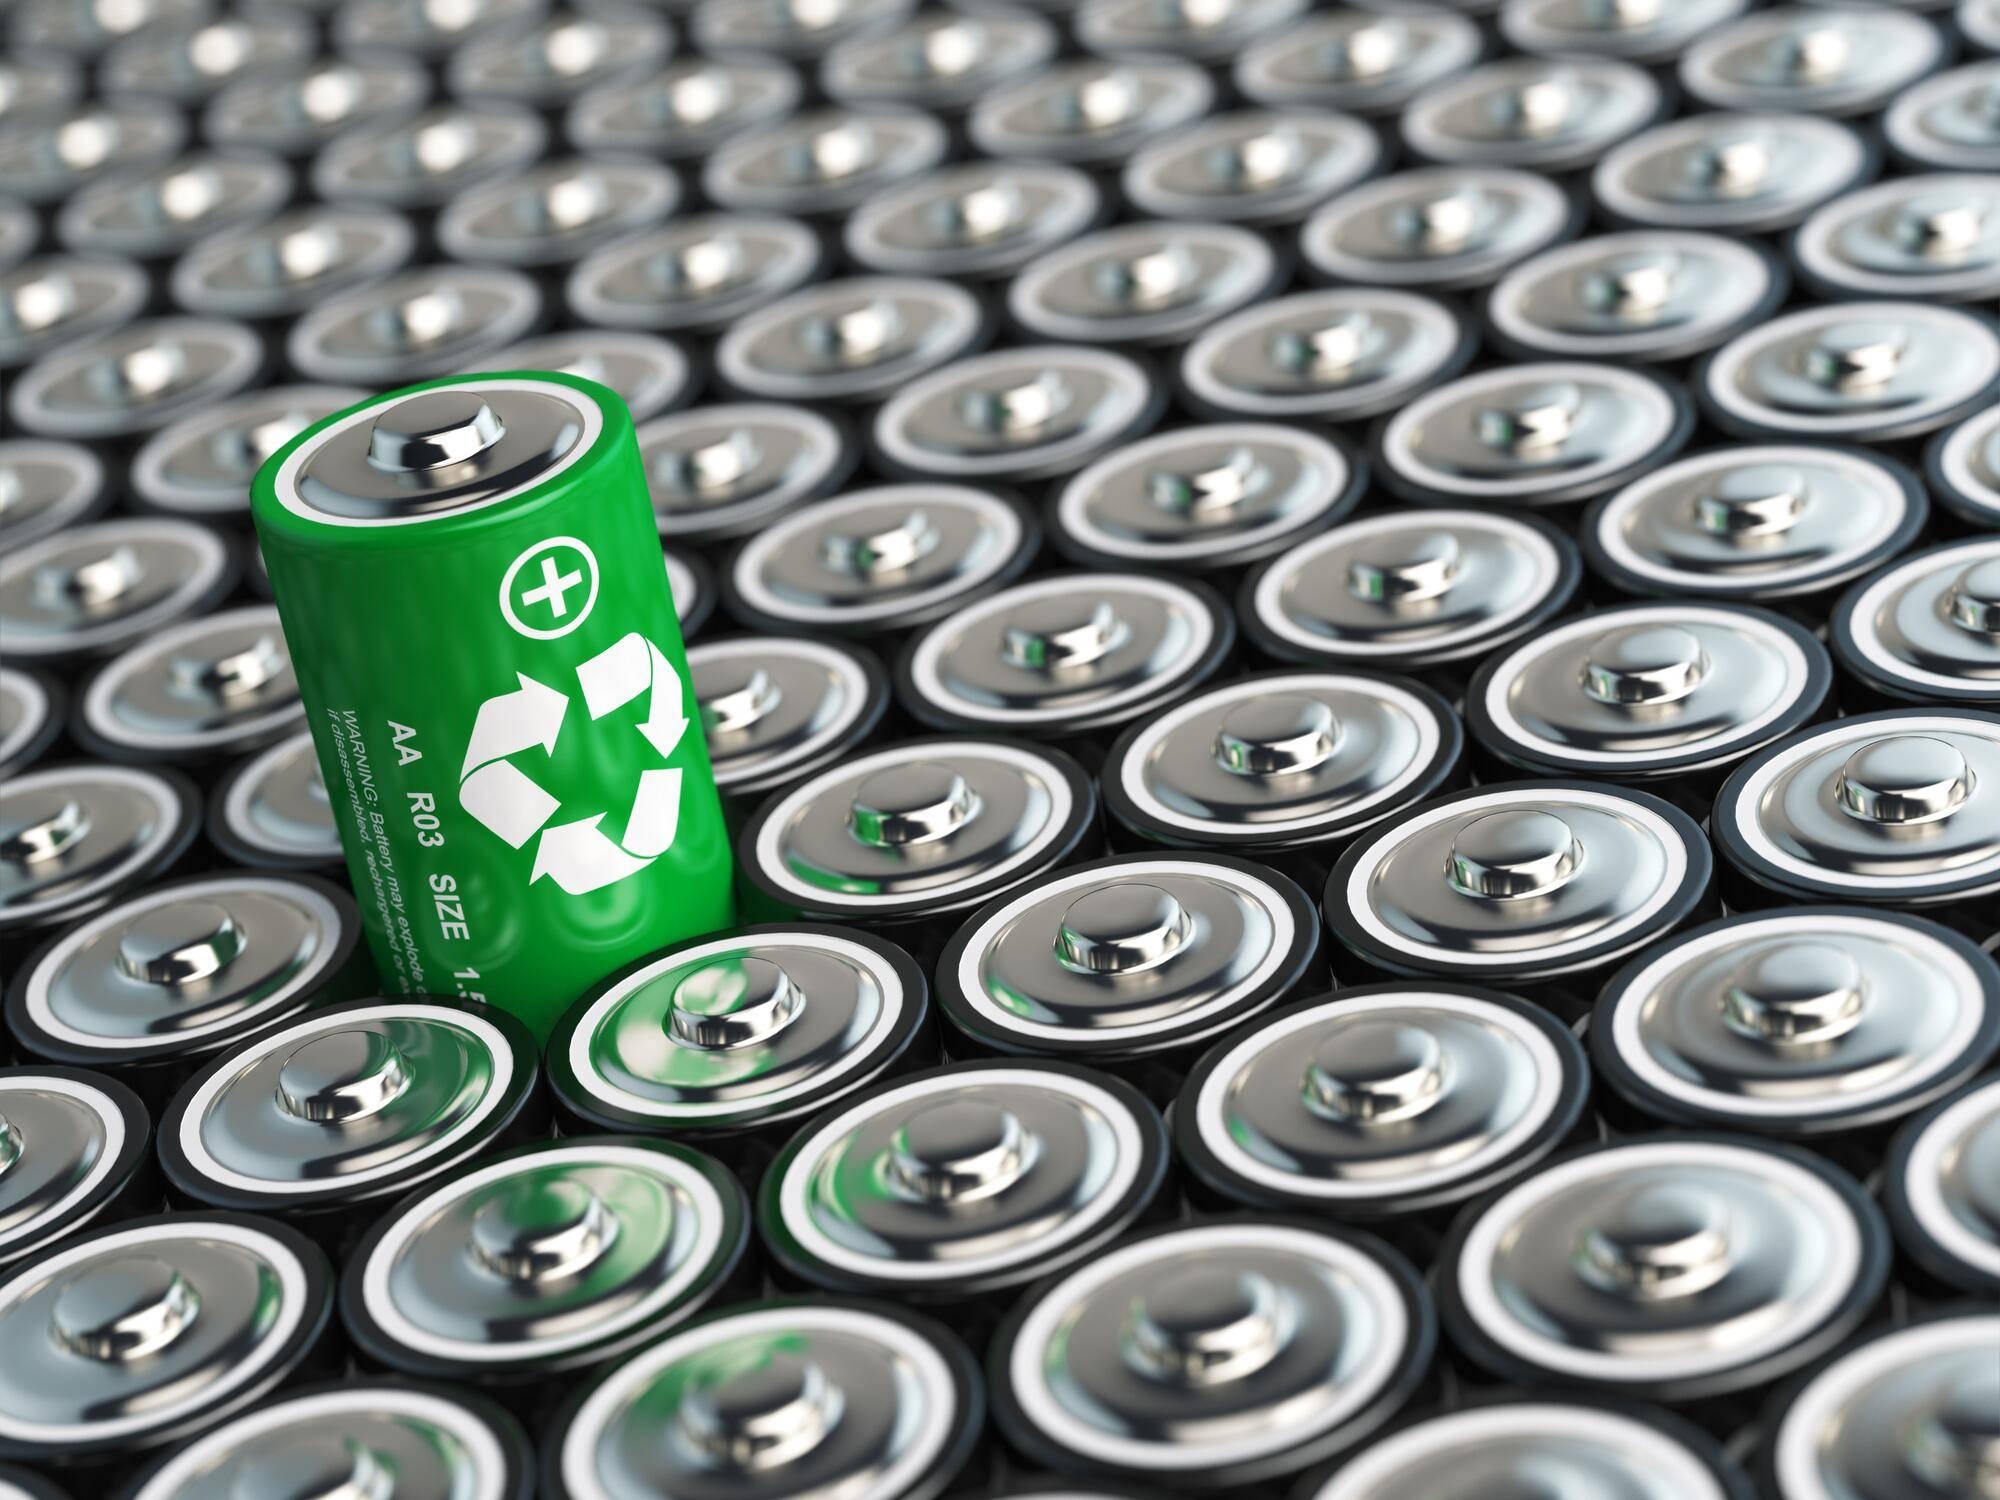 Sondermull So Entsorgen Sie Altol Batterien Farbe Co Richtig